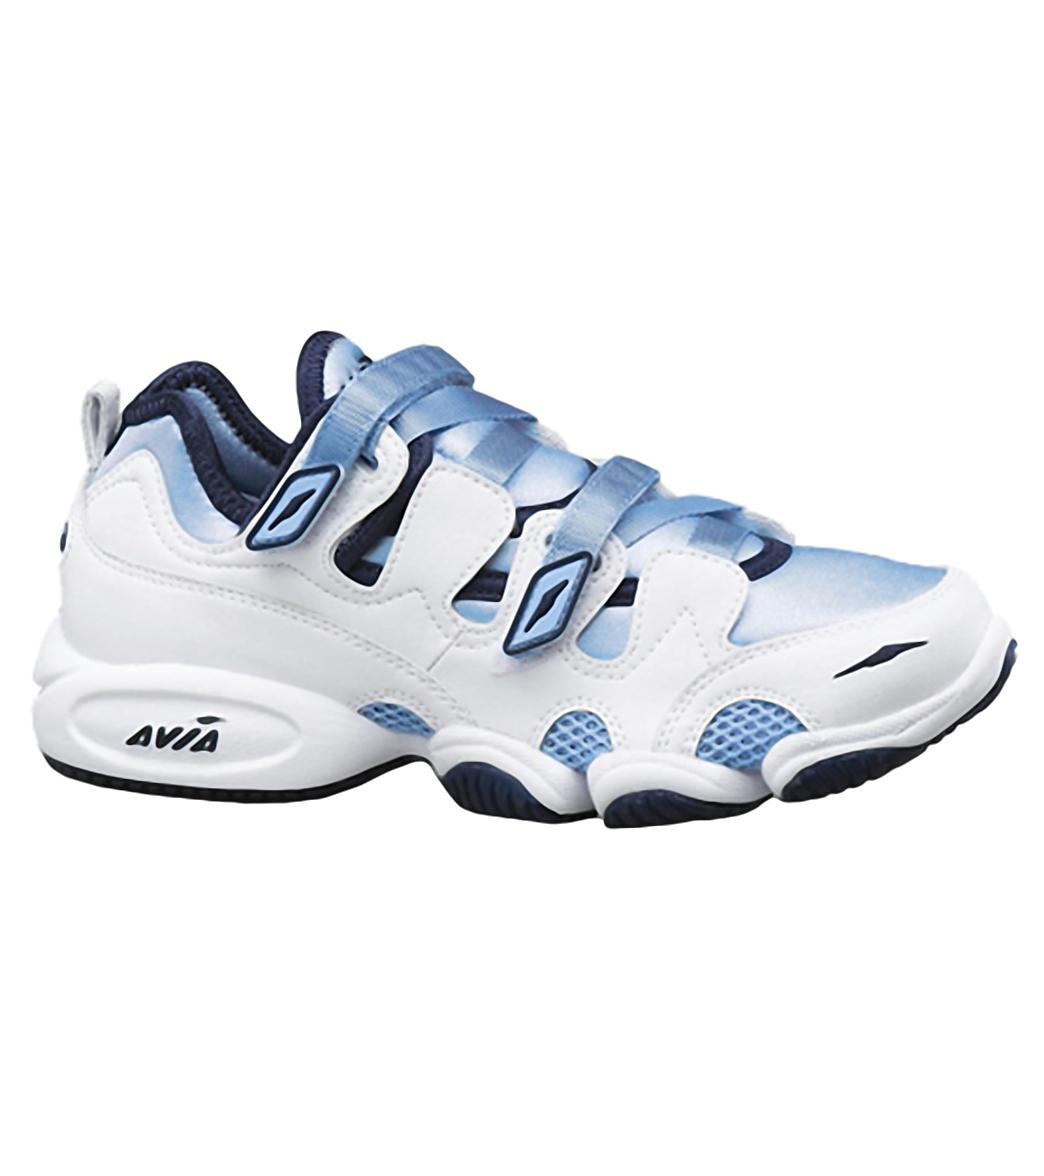 c003e1ef695e Avia Women s Water Fitness Shoes at SwimOutlet.com